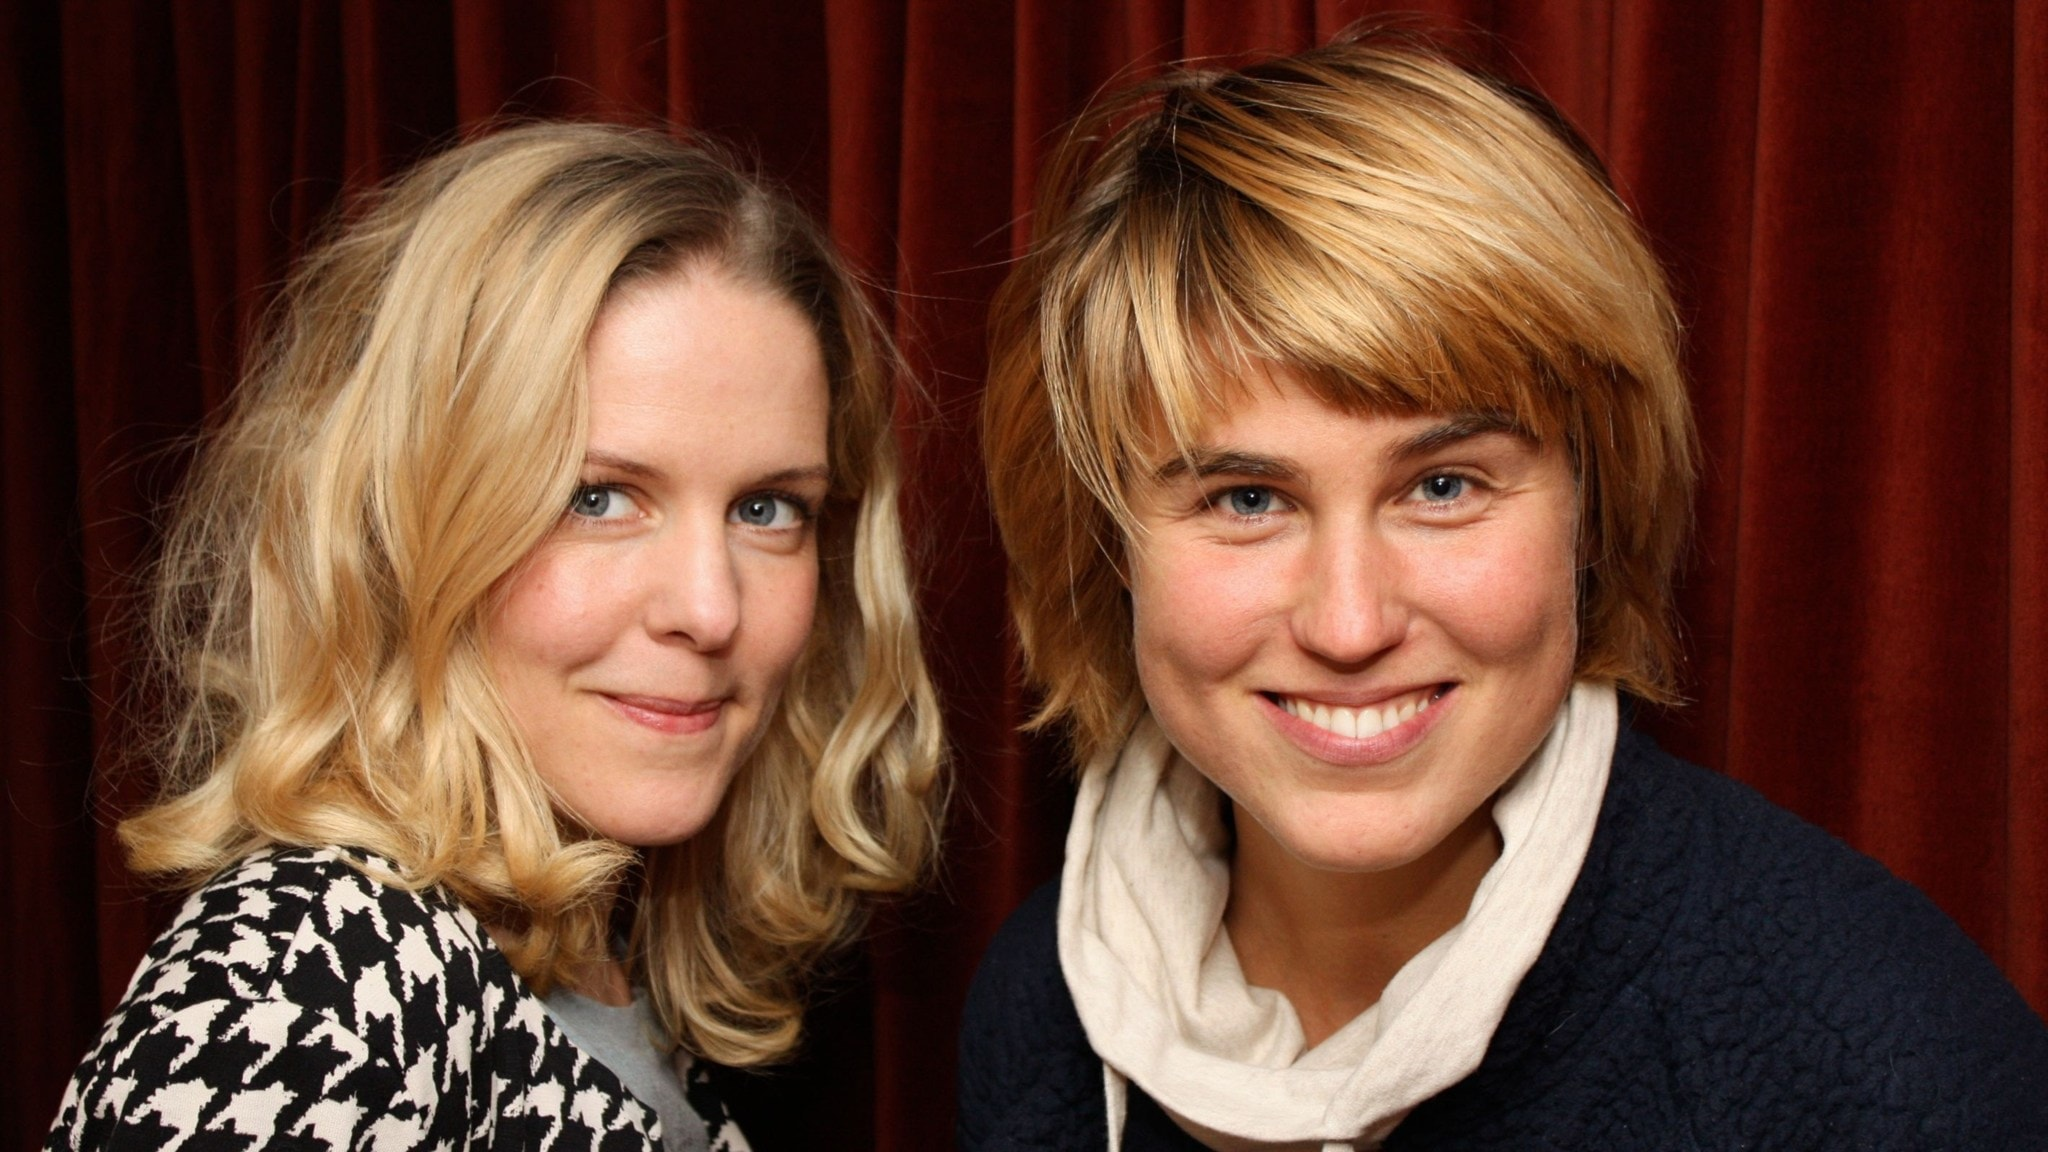 Sofia Karlsson och Elsa Bergman foto: David Silva